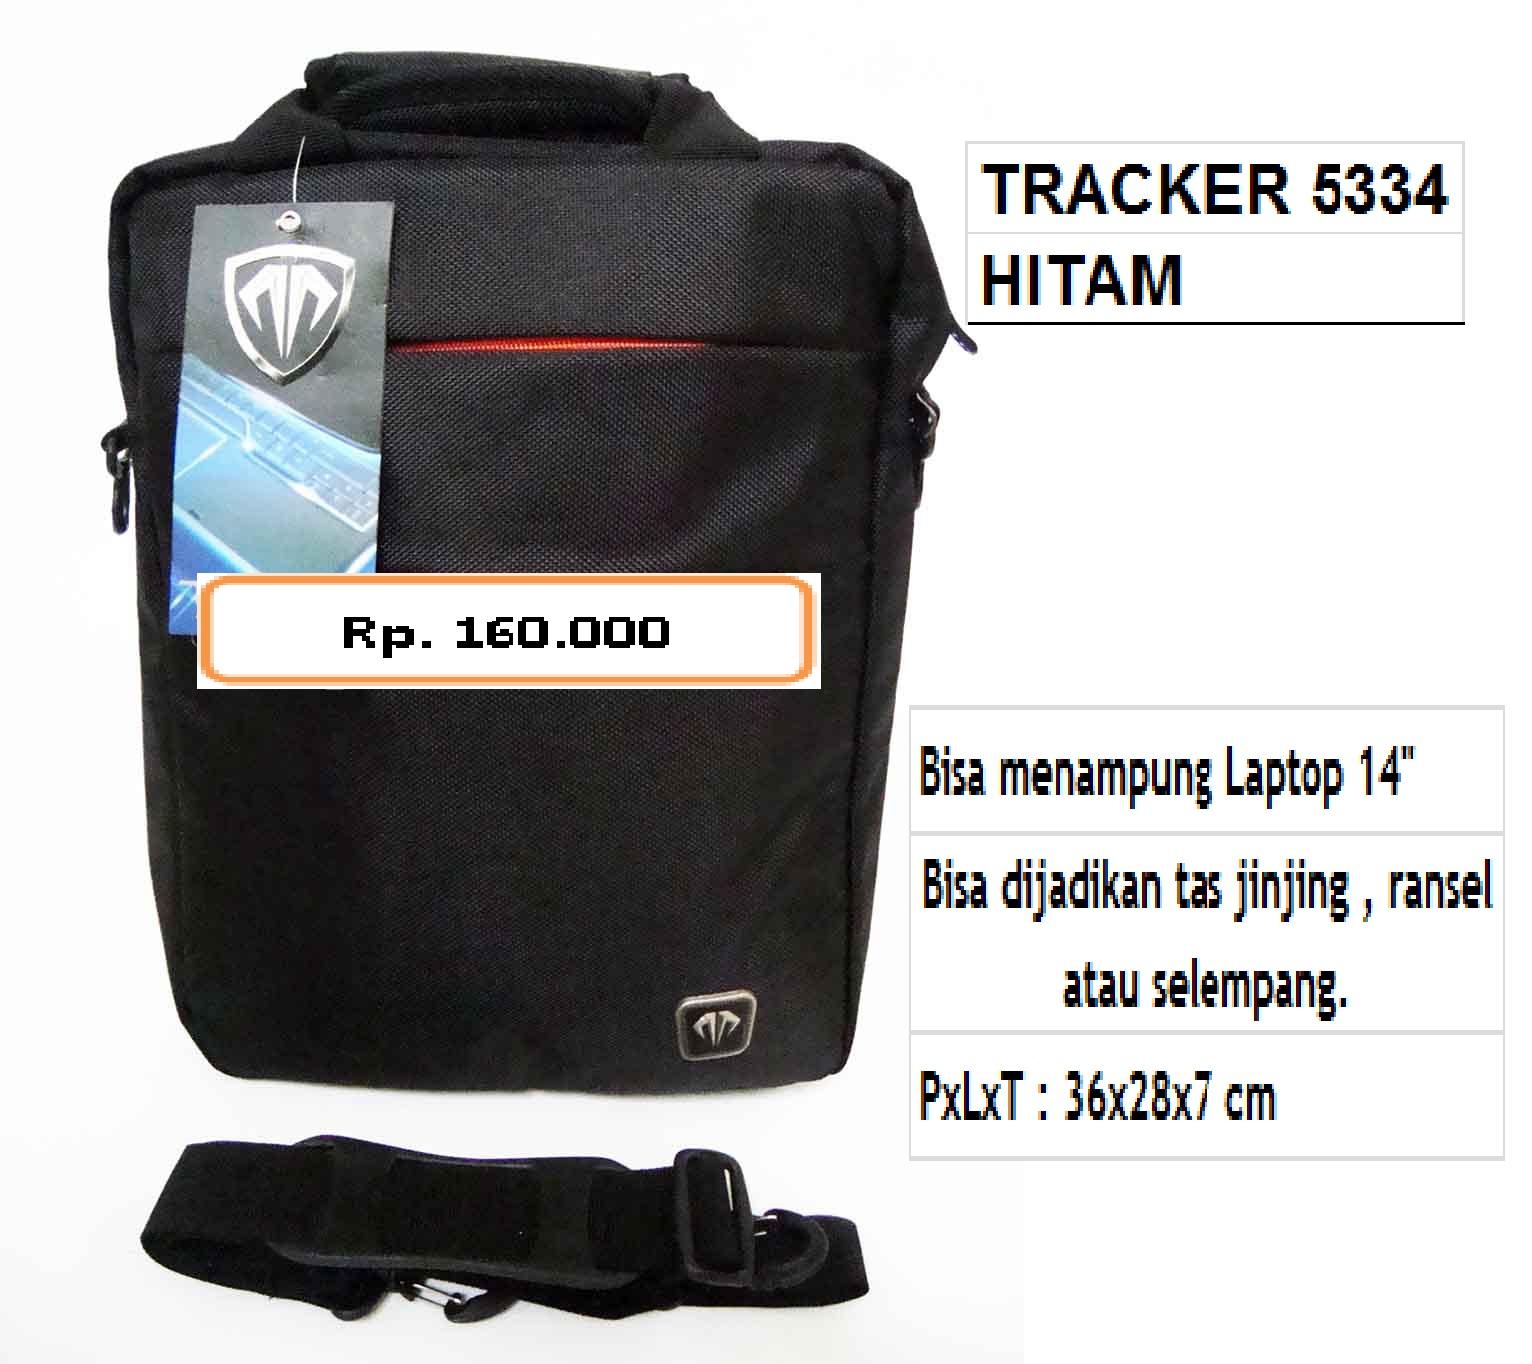 03 TRACKER 5334